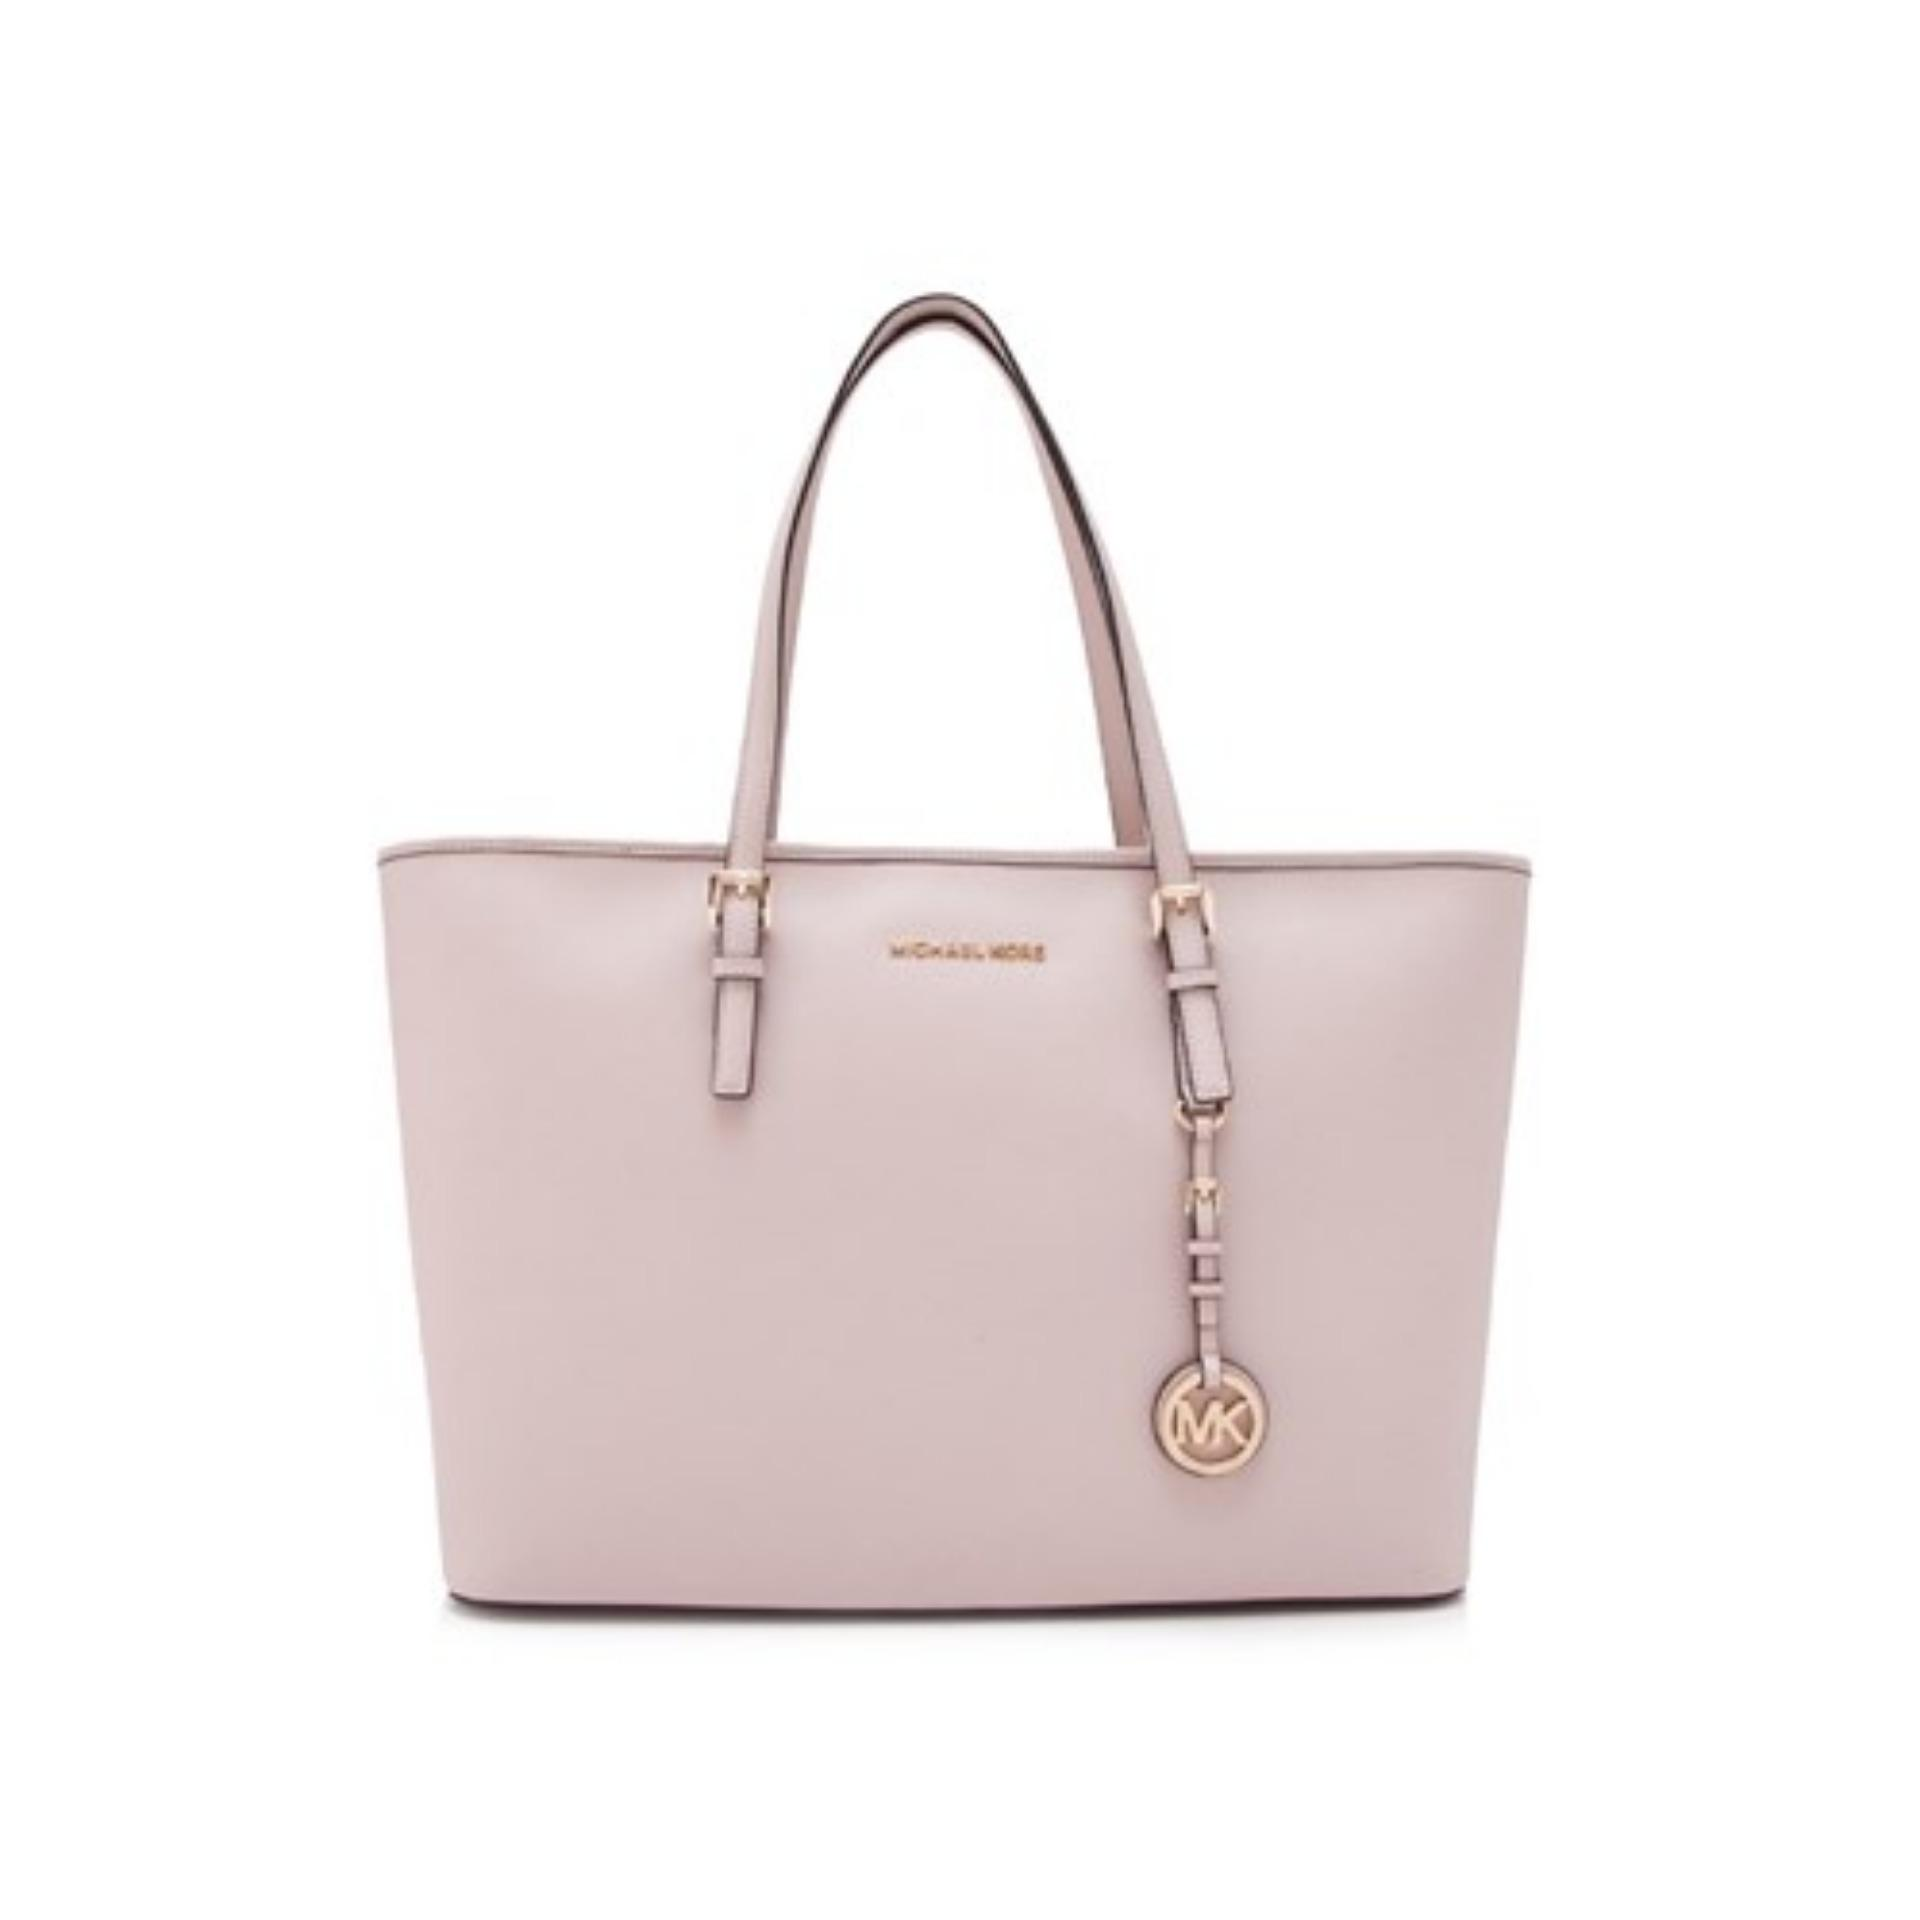 Buy Women Michael Kors Bags Totes Lazada Selma Medium Lilac Authentic Jet Set Travel Gold Tone Top Multifunctional Tote Bag Soft Pink